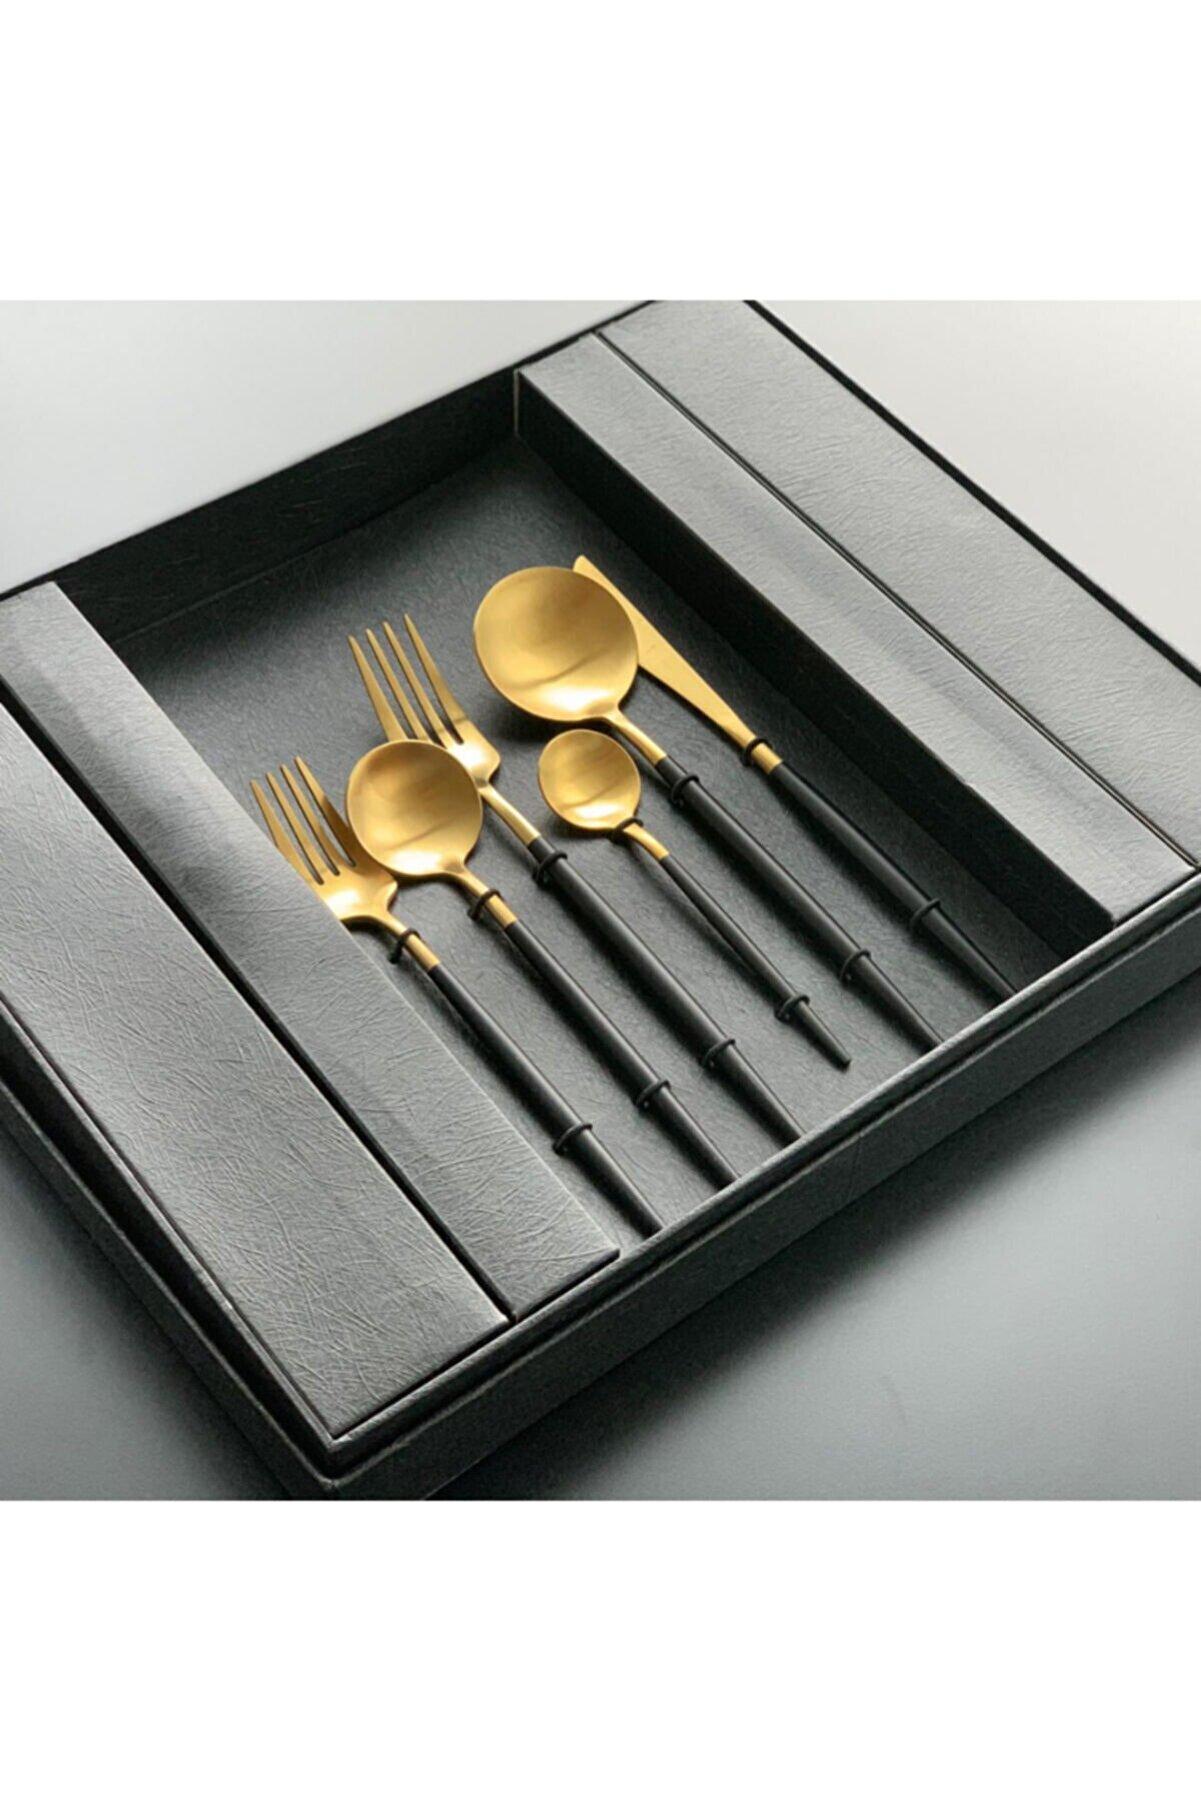 Lemm Home Mat Altın-siyah Çkb Seti 6 Kişilik 36 Parça